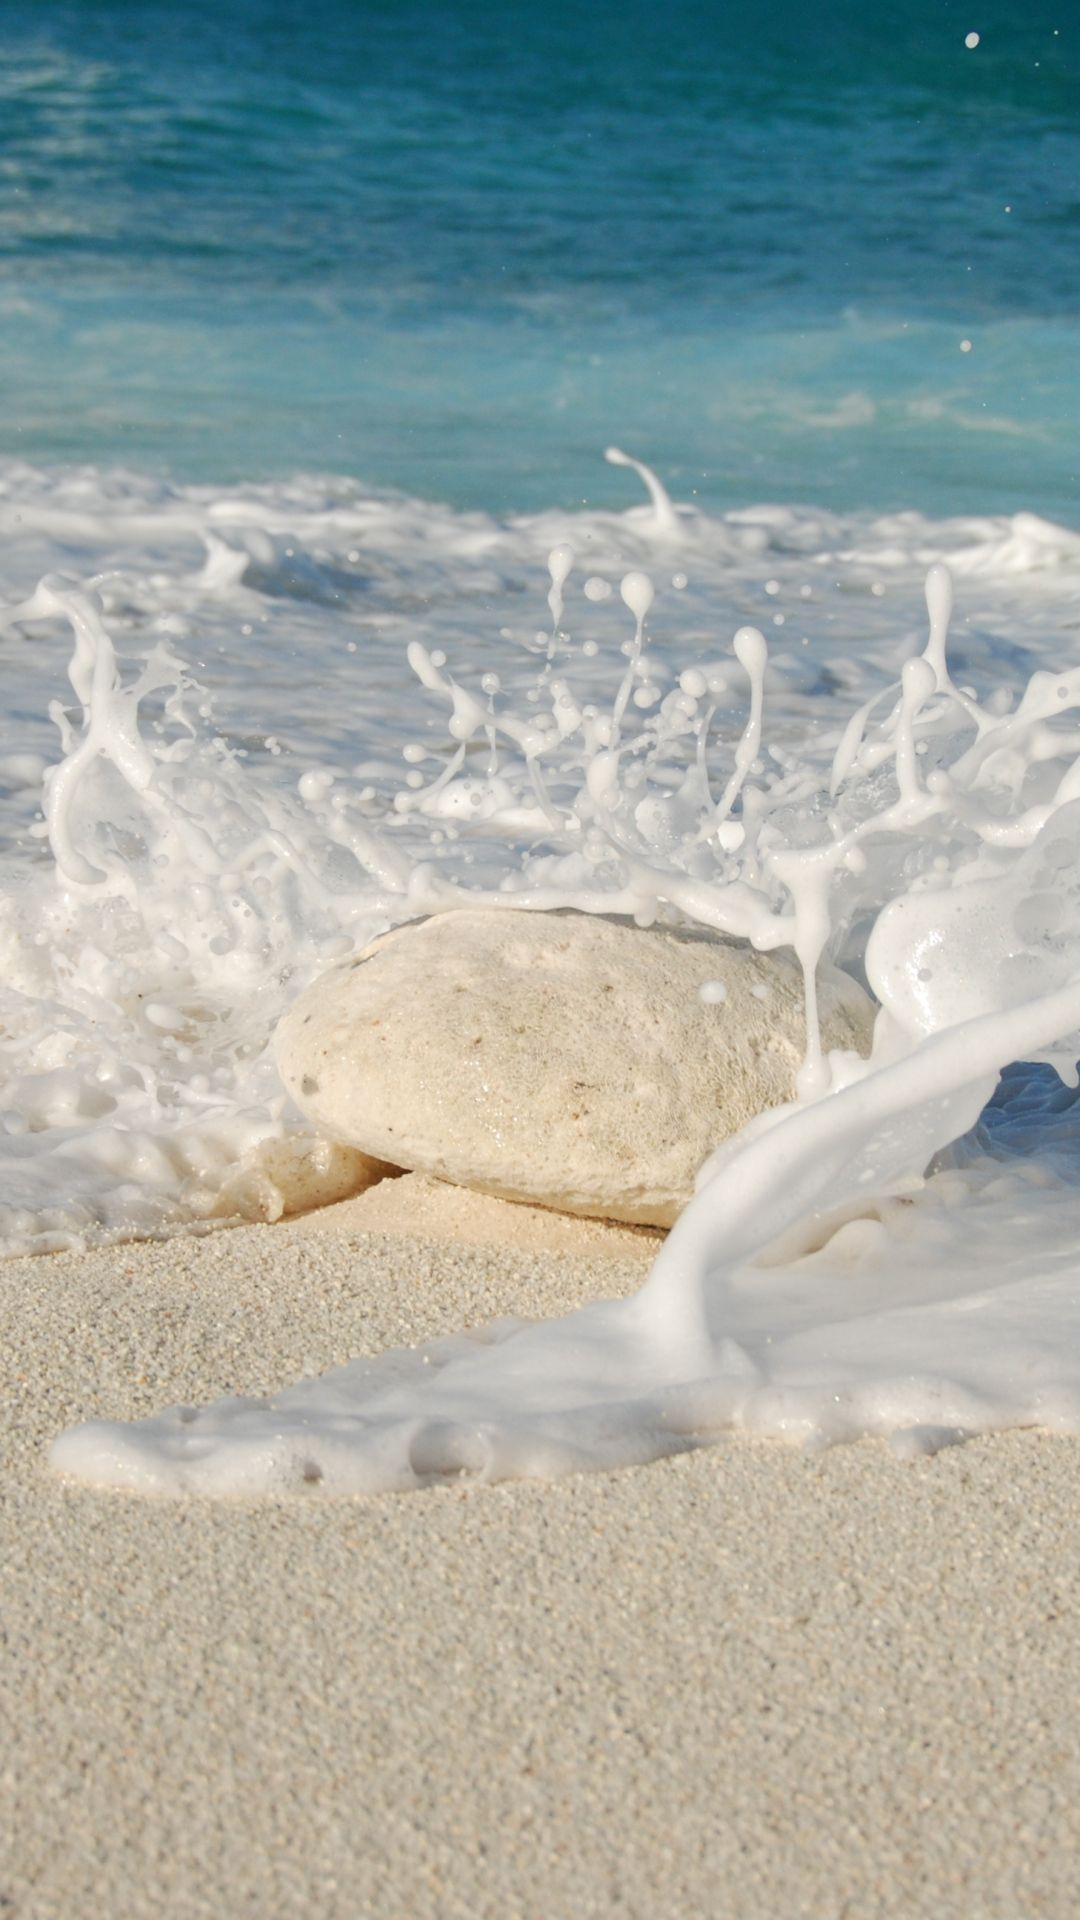 Sea, Ocean, Sand, Stone, Splash Wallpaper, | Infinity ...